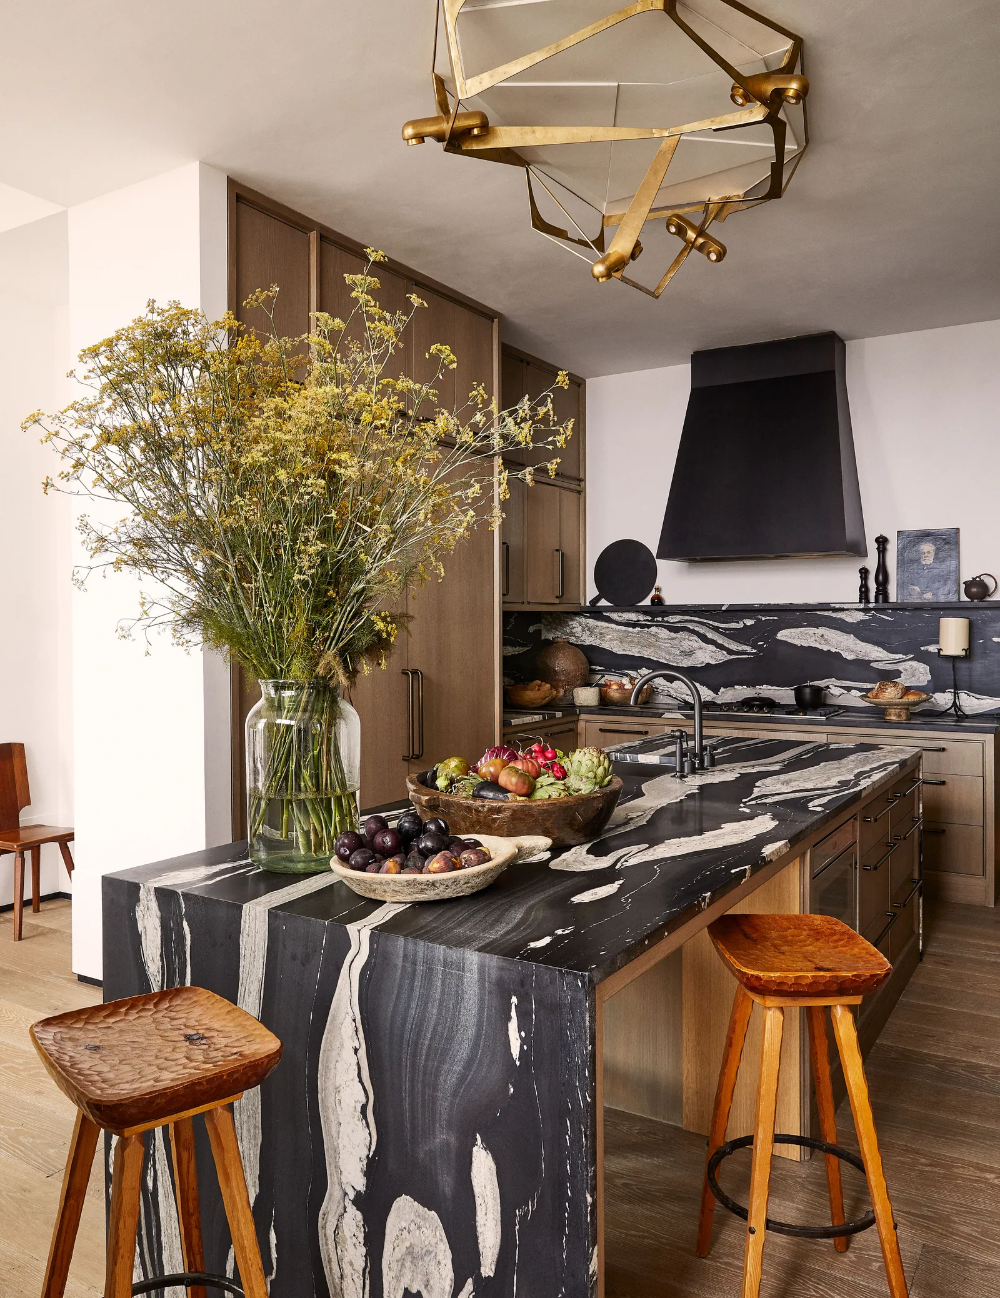 AD100 Designer Monique Gibson Designs a Tribeca Aerie with High-Impact Views